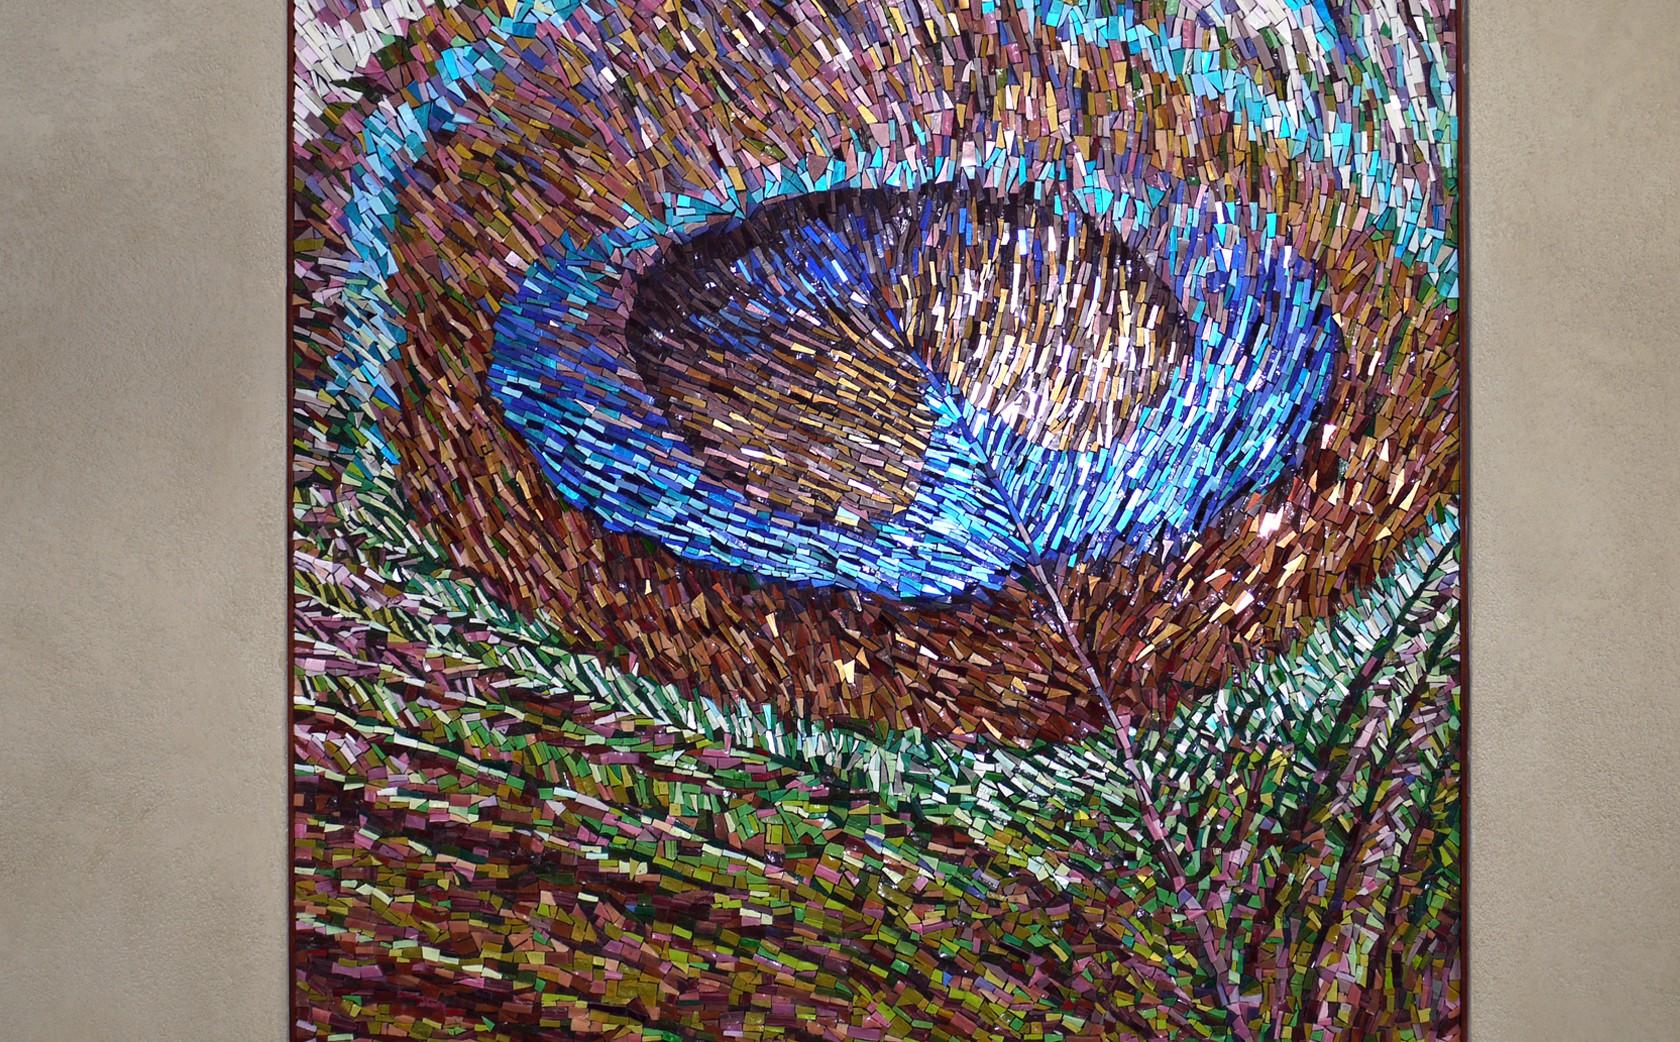 Peacock Feather Mosaic 1 x 1 metres